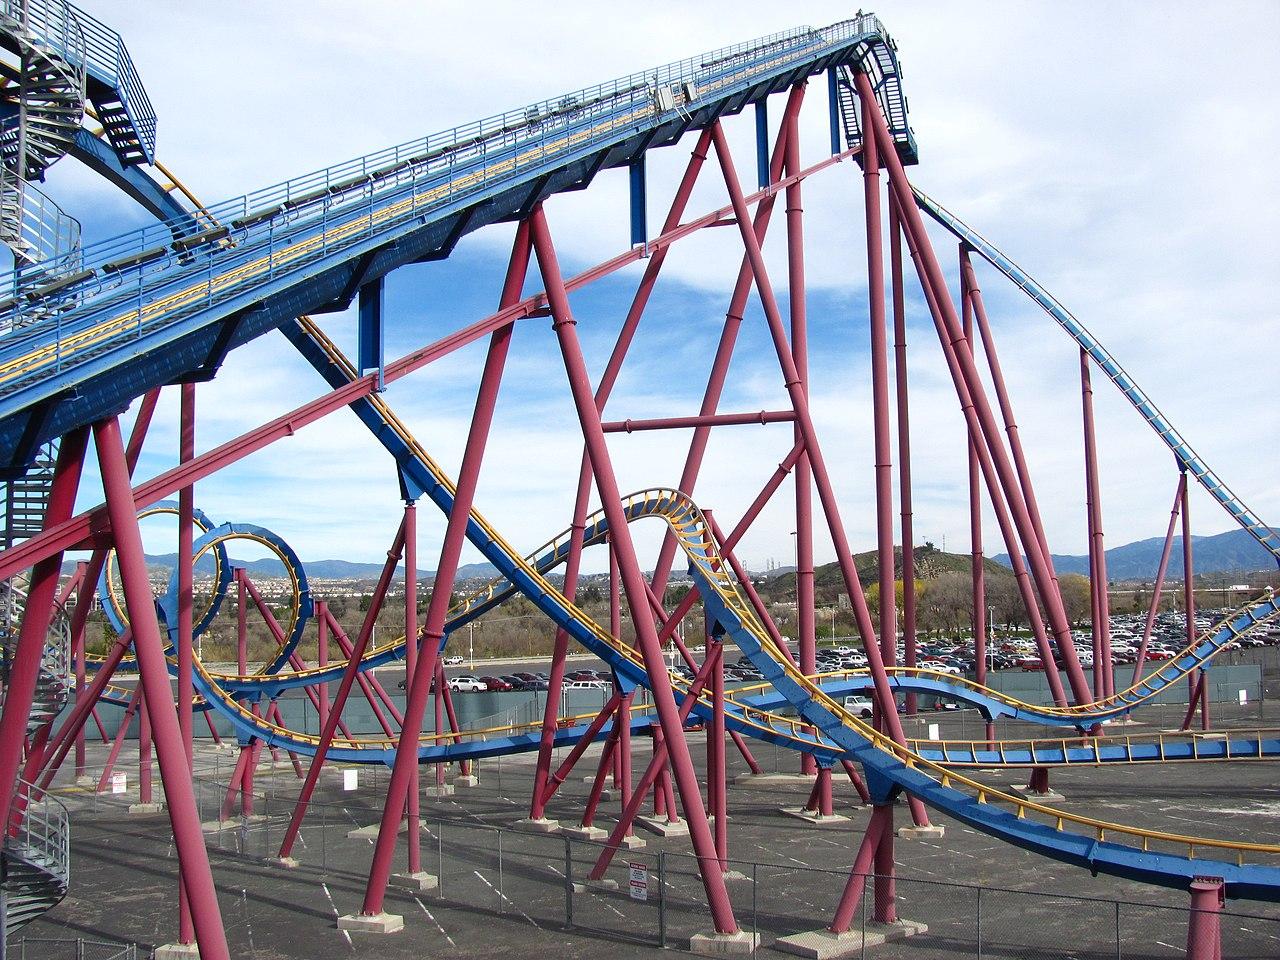 1280px-Scream_lift_hill.jpg